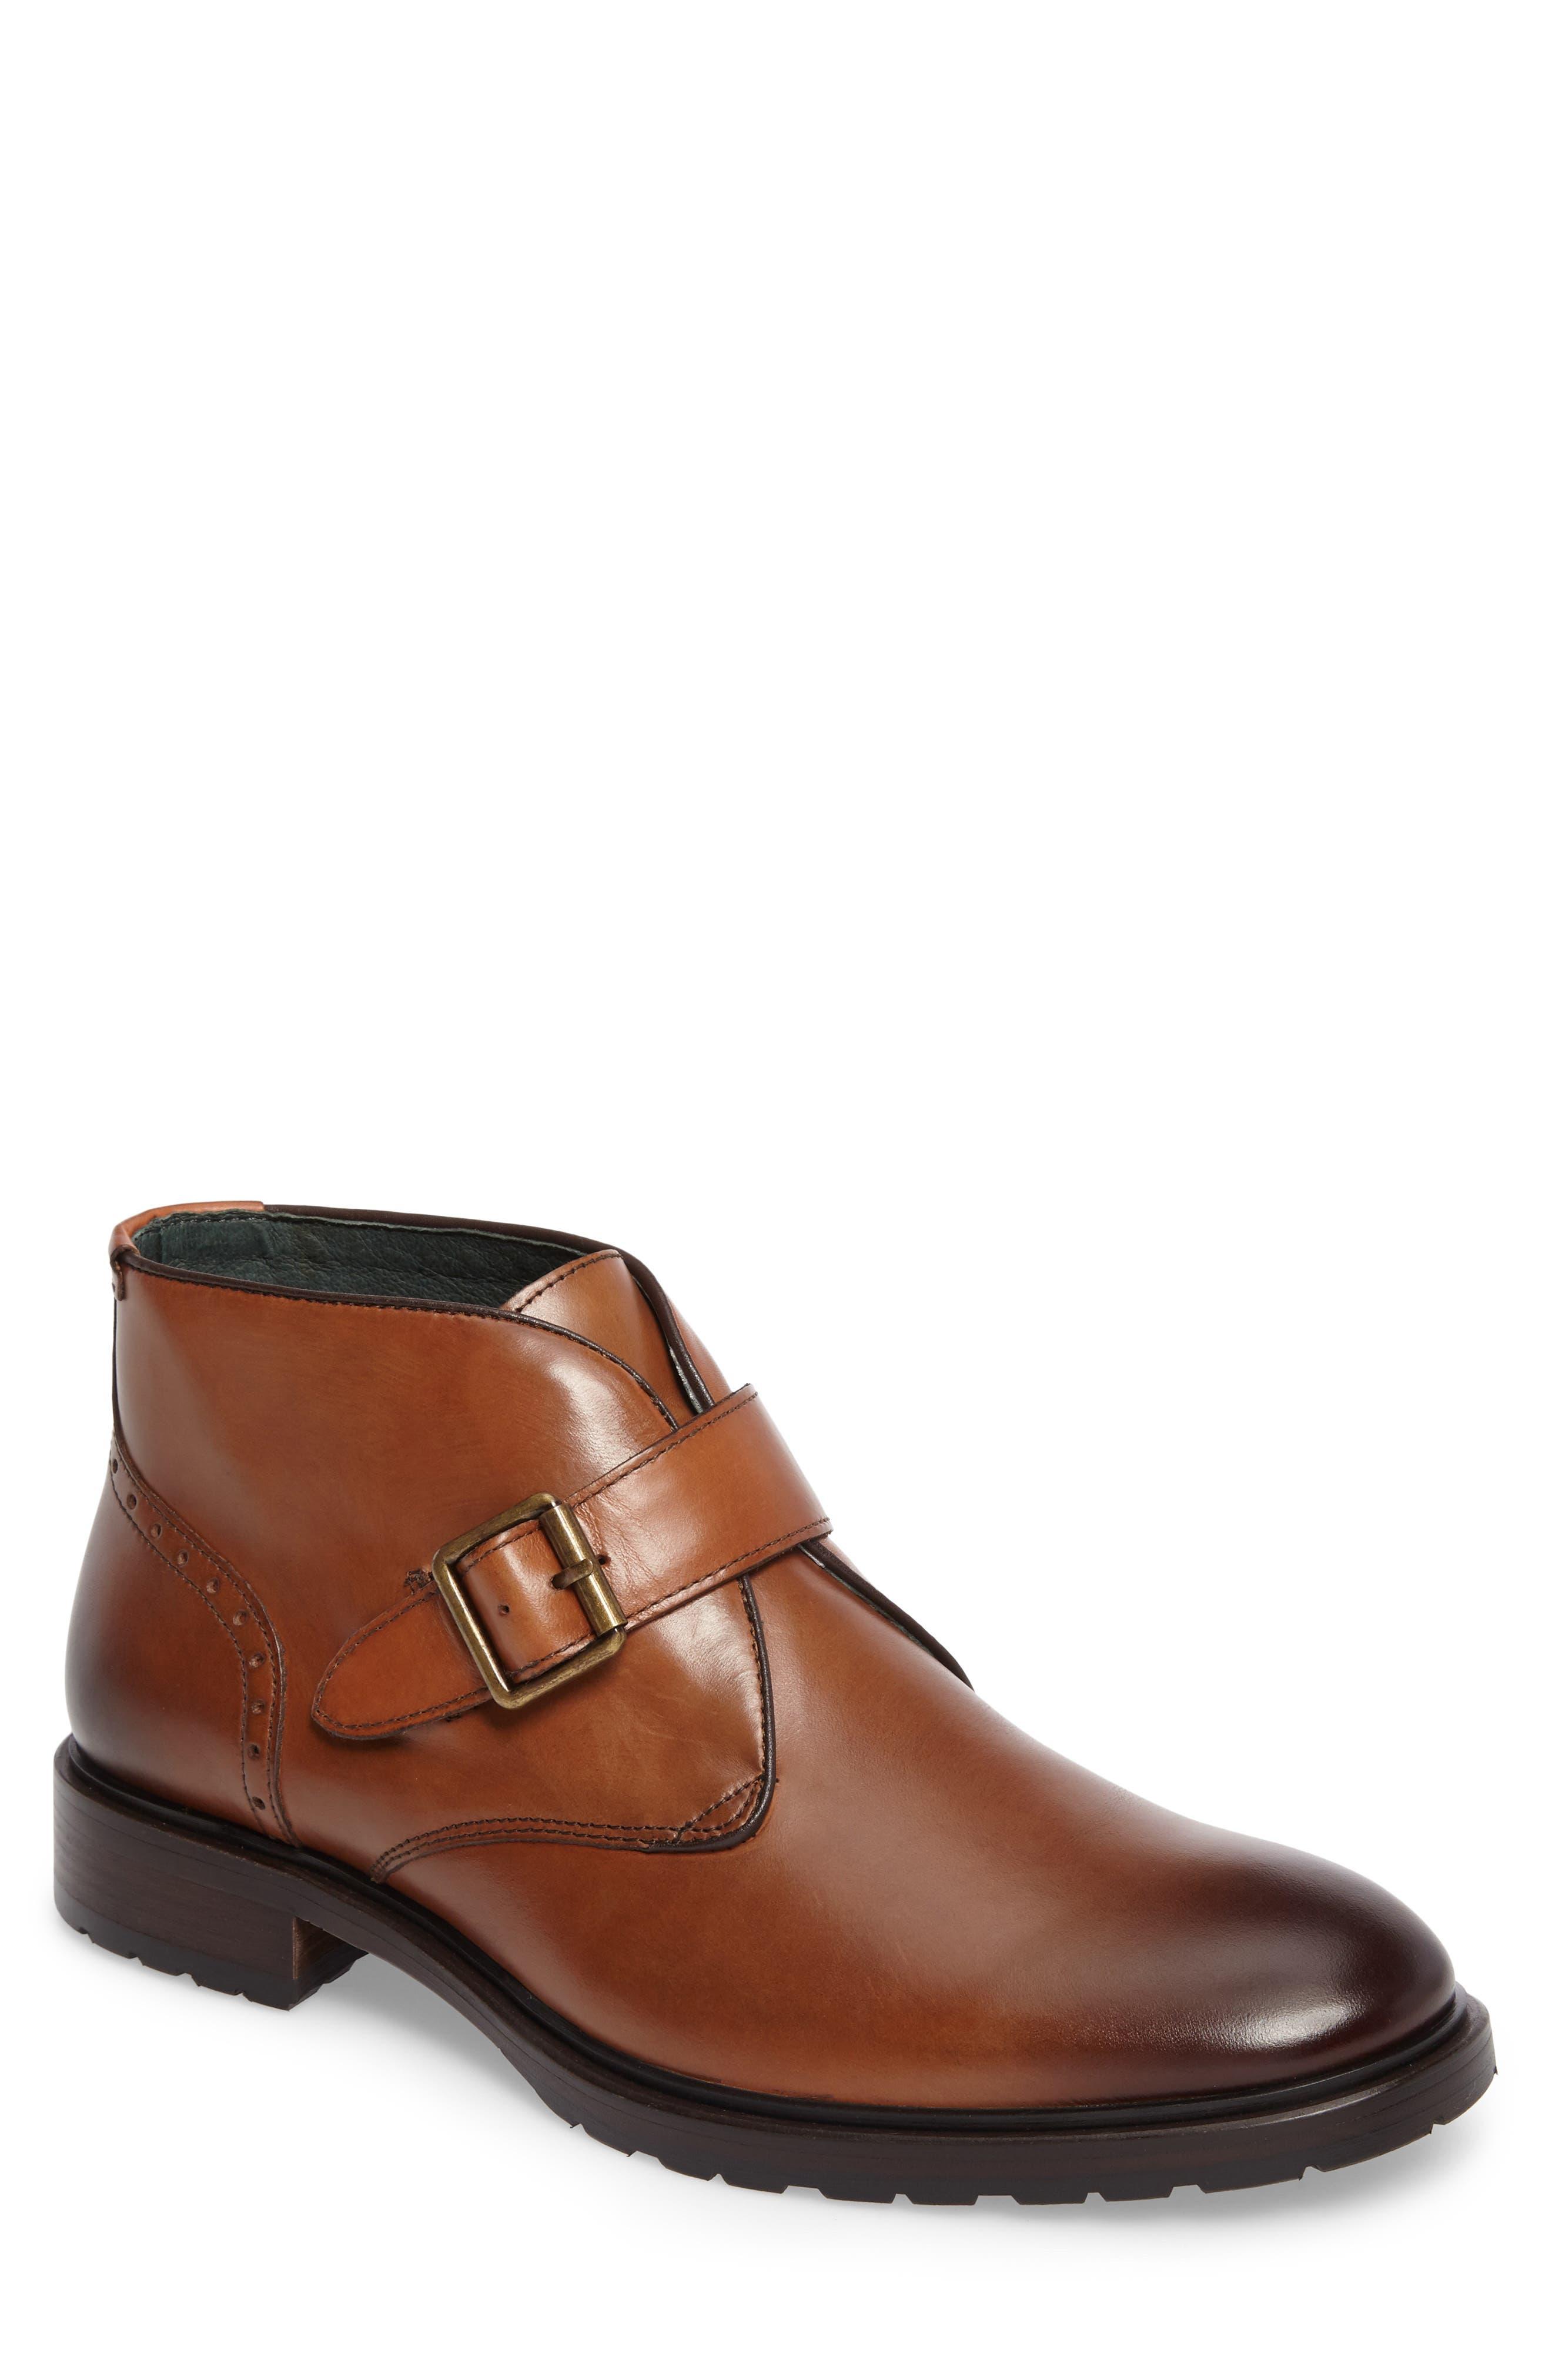 Myles Monk Strap Boot,                         Main,                         color, Cognac Leather